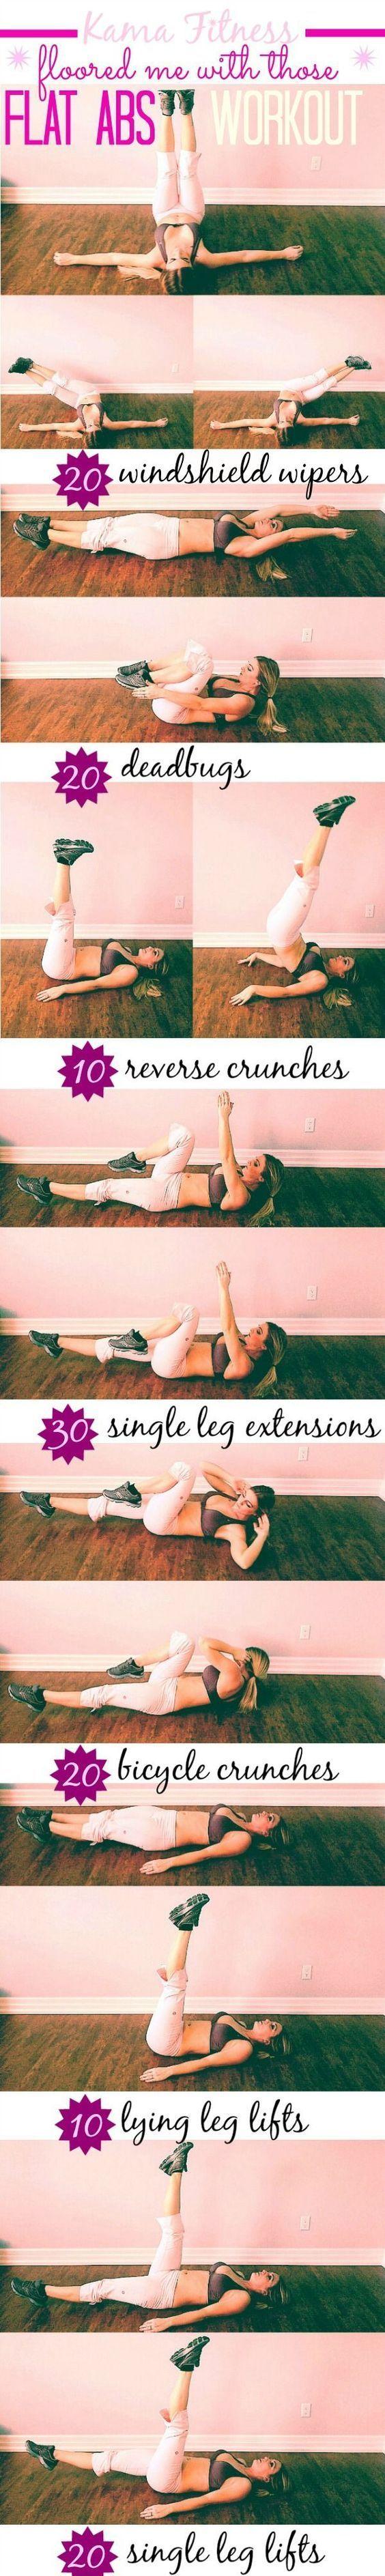 best 25 home workout plans ideas on pinterest 10 week workout